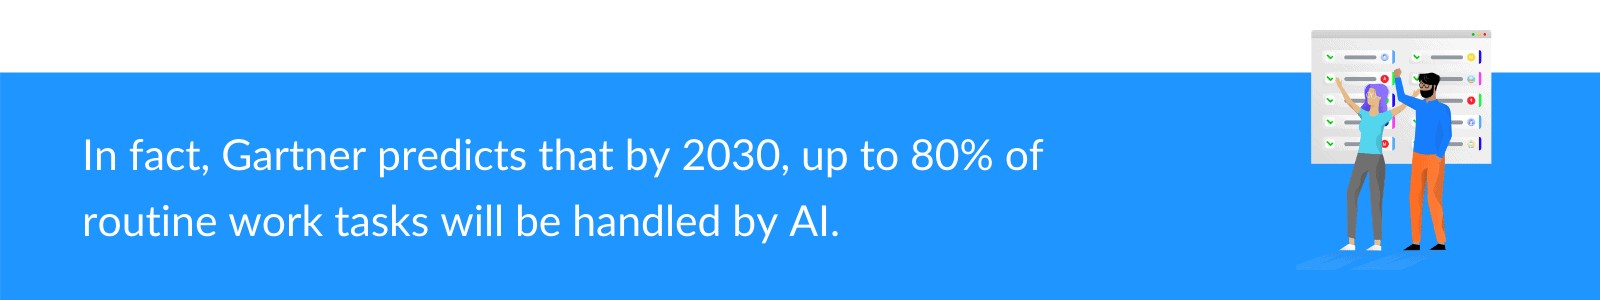 Prédiction Gartner AI